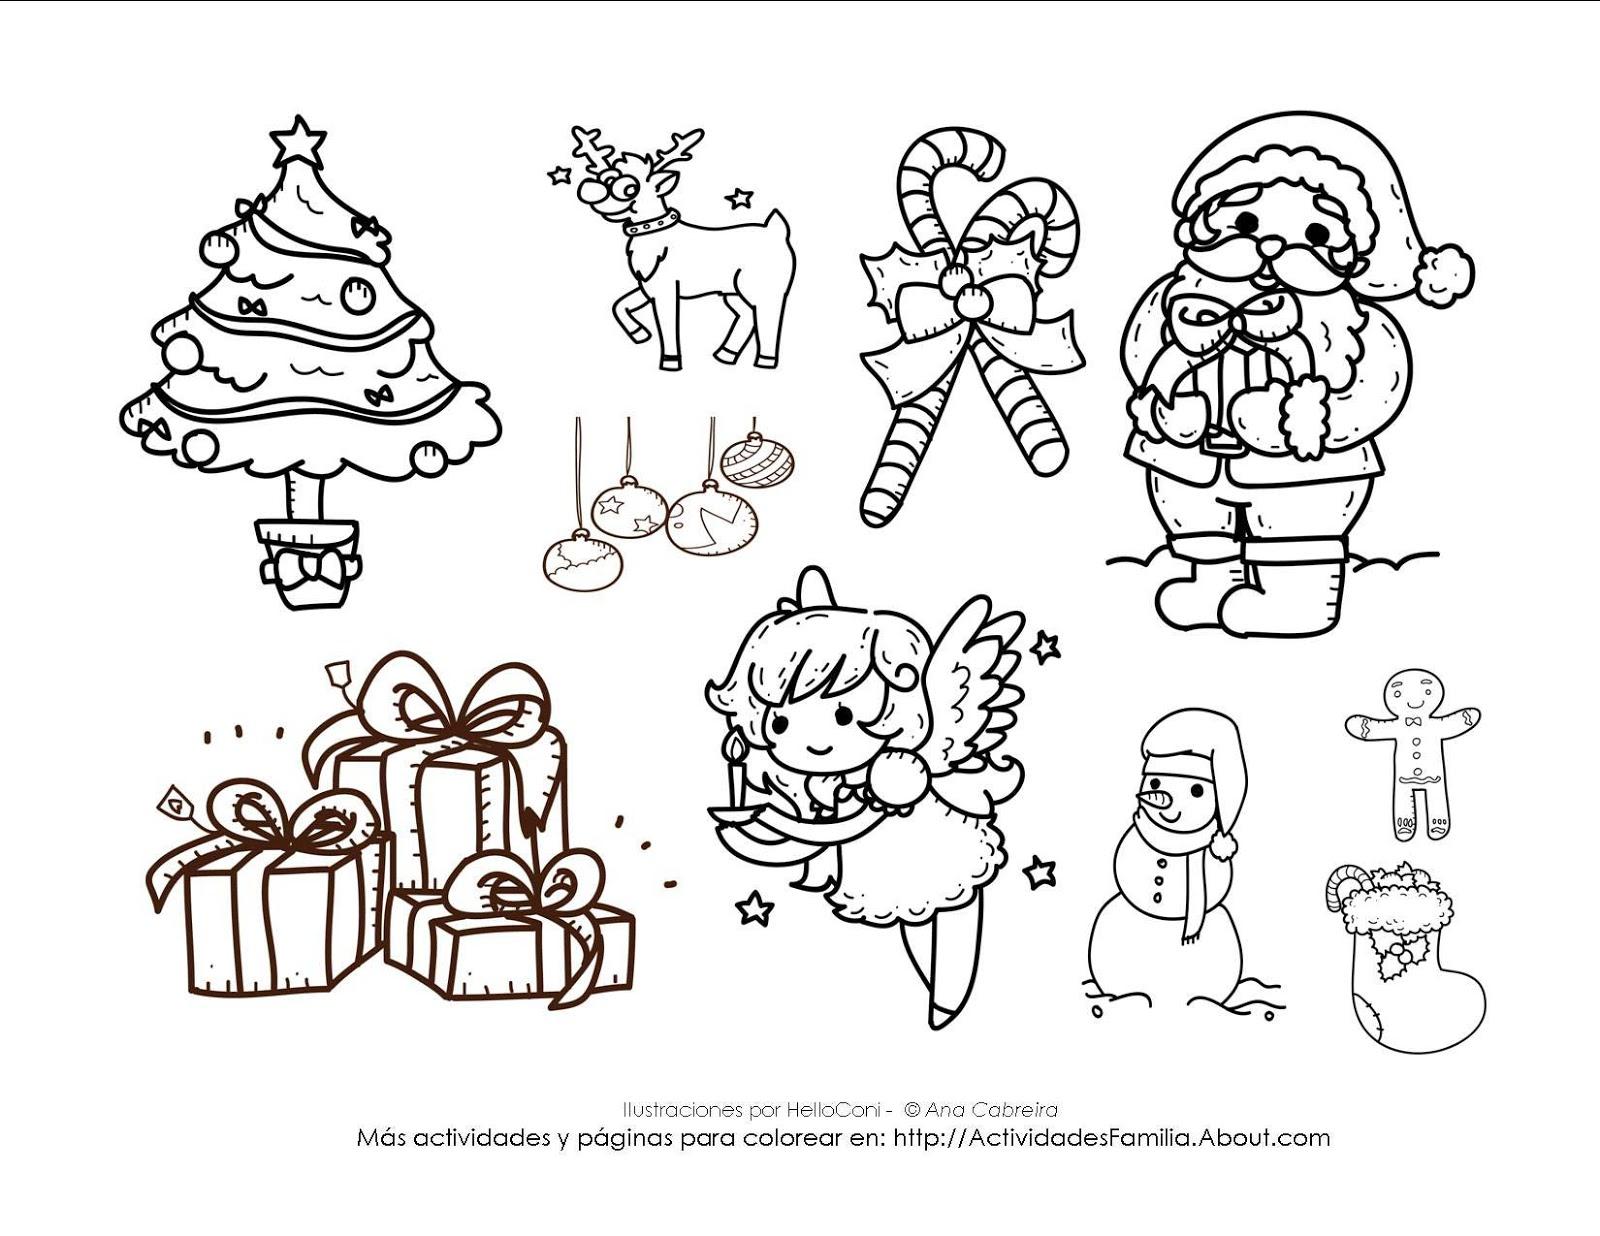 Dibujos Para Colorear Navidenos Imprimir: Dibujos Para Colorear